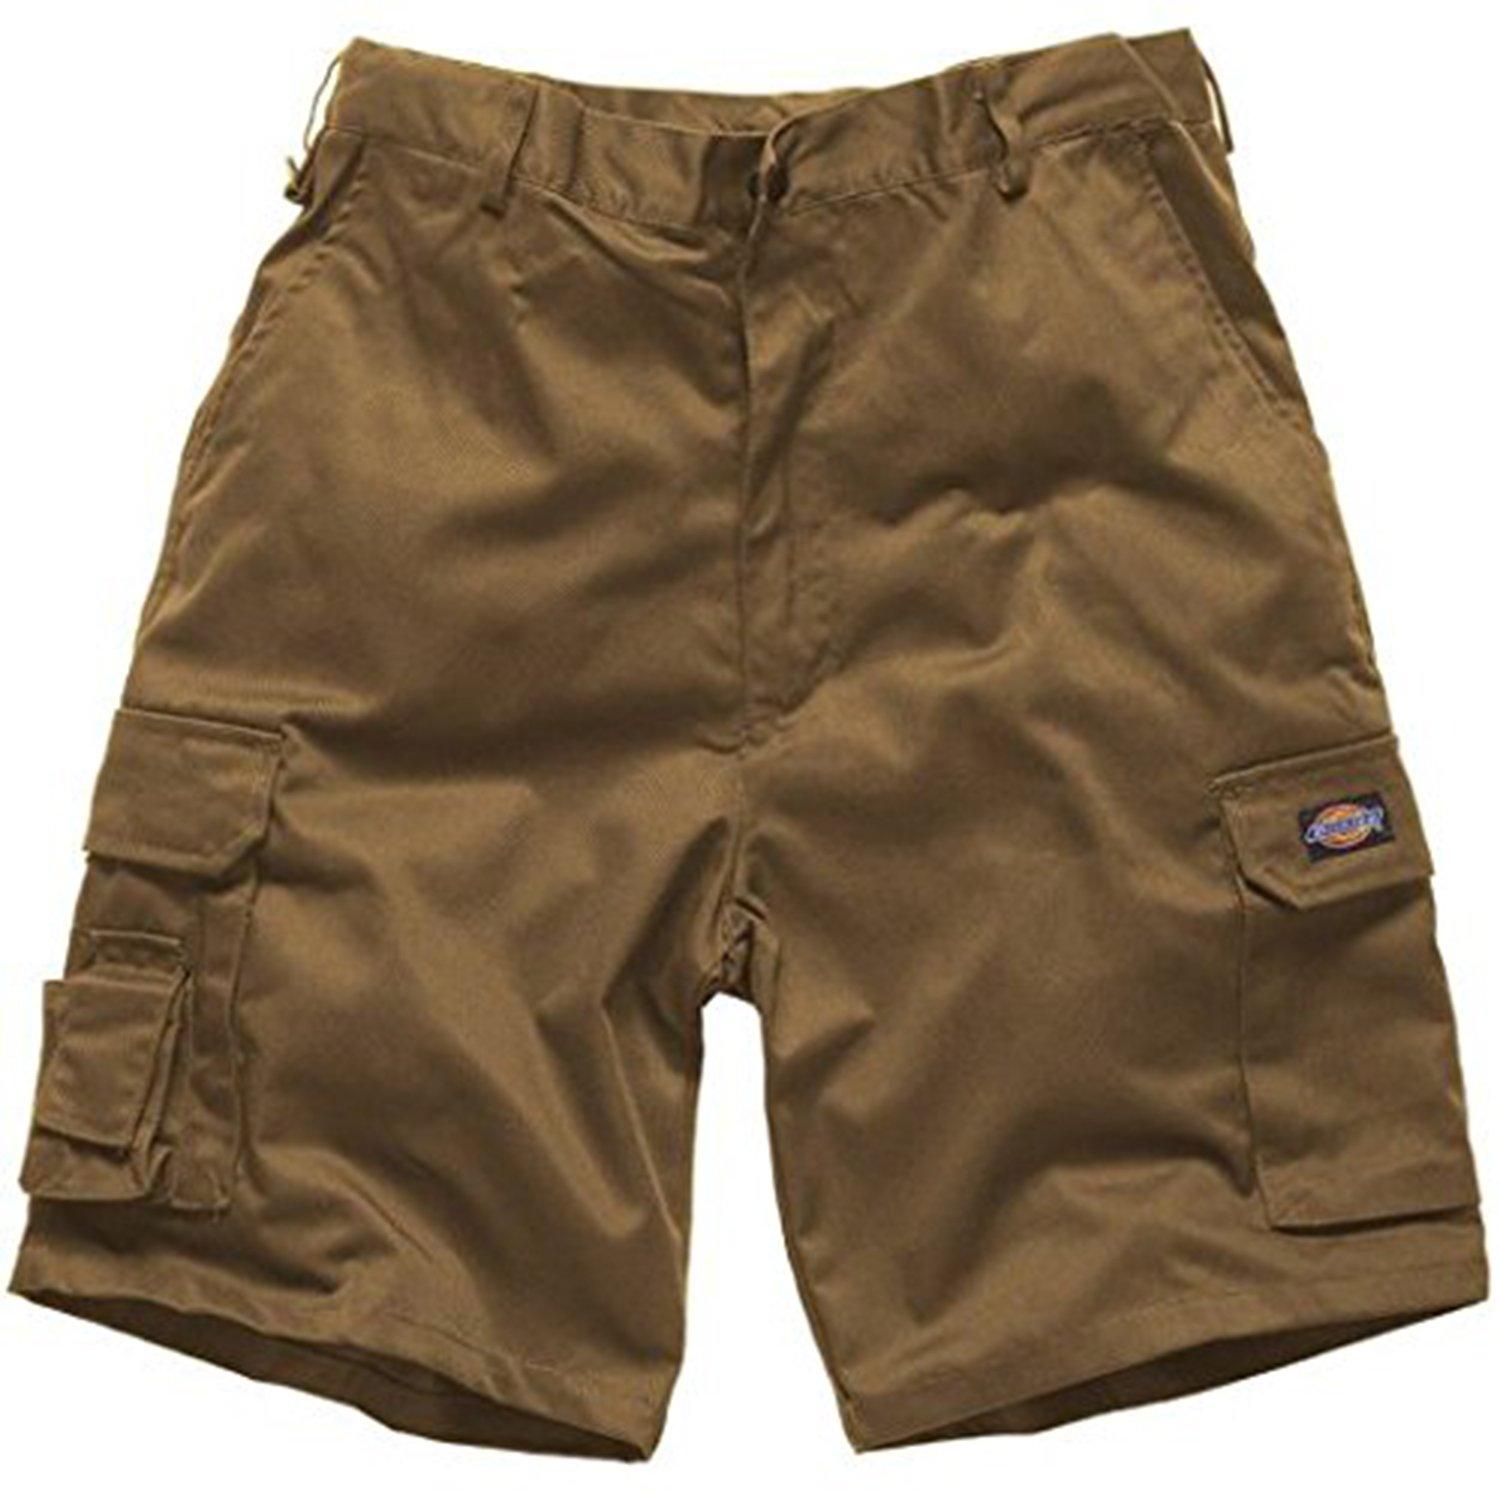 Black Size 34 Lee Cooper Workwear LCSHO806 Mens Multi Pocket Work Safety Pants Cargo Shorts